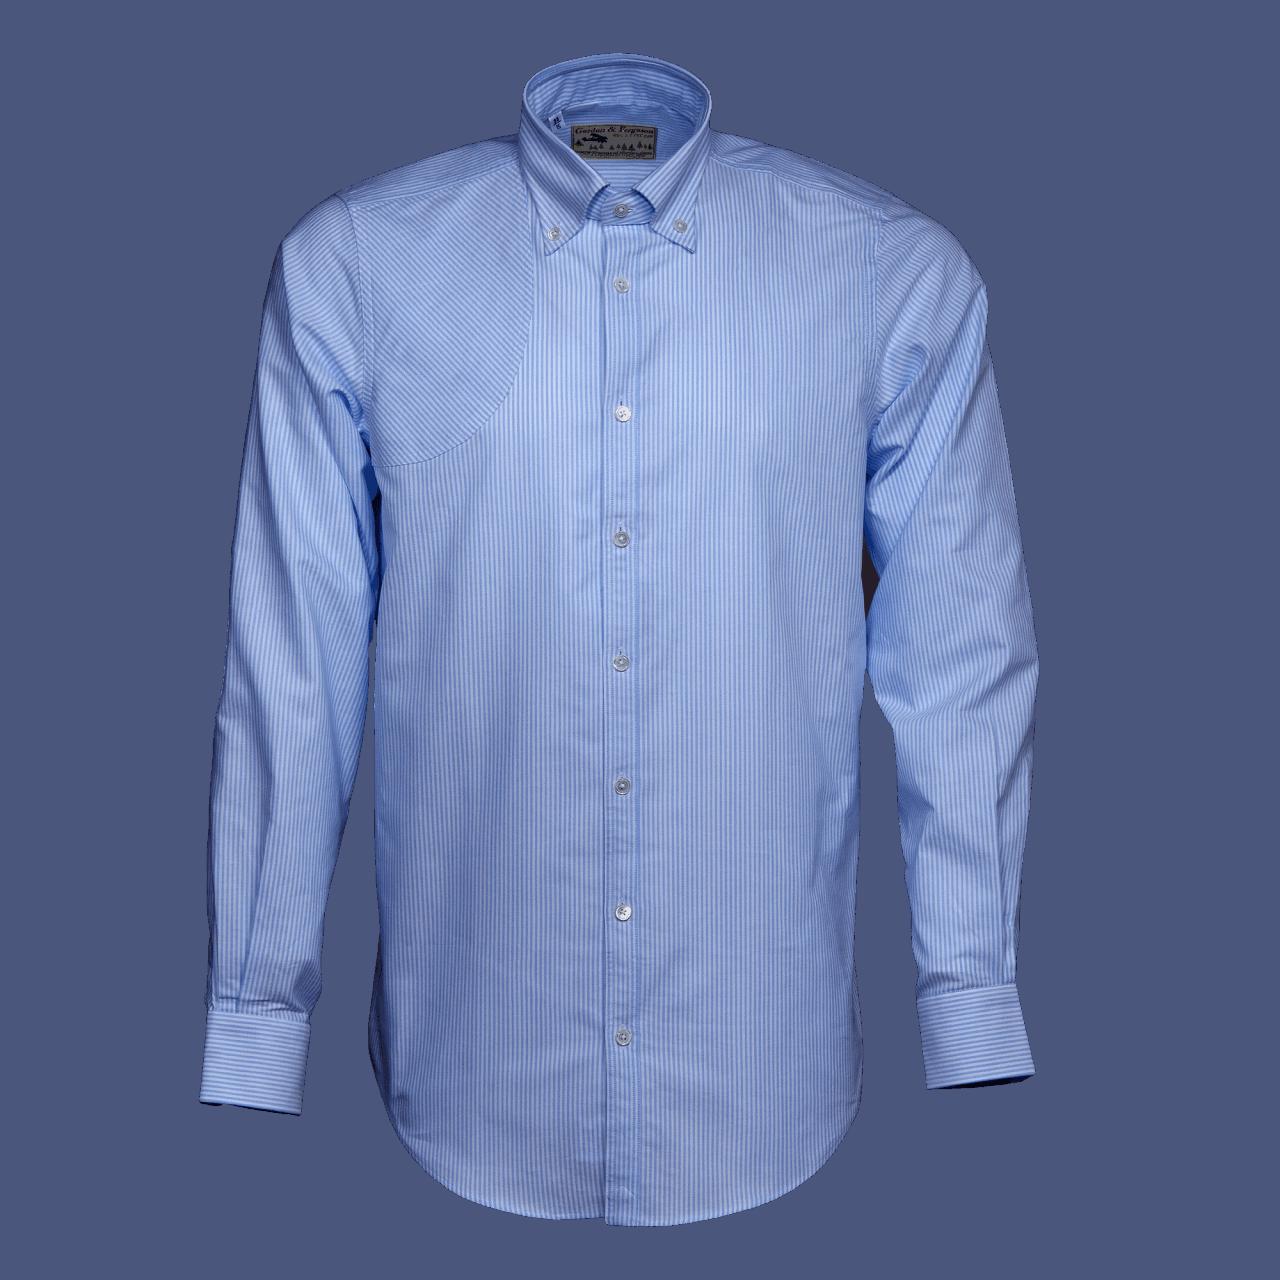 G&F Hunting Shirt White Stripe